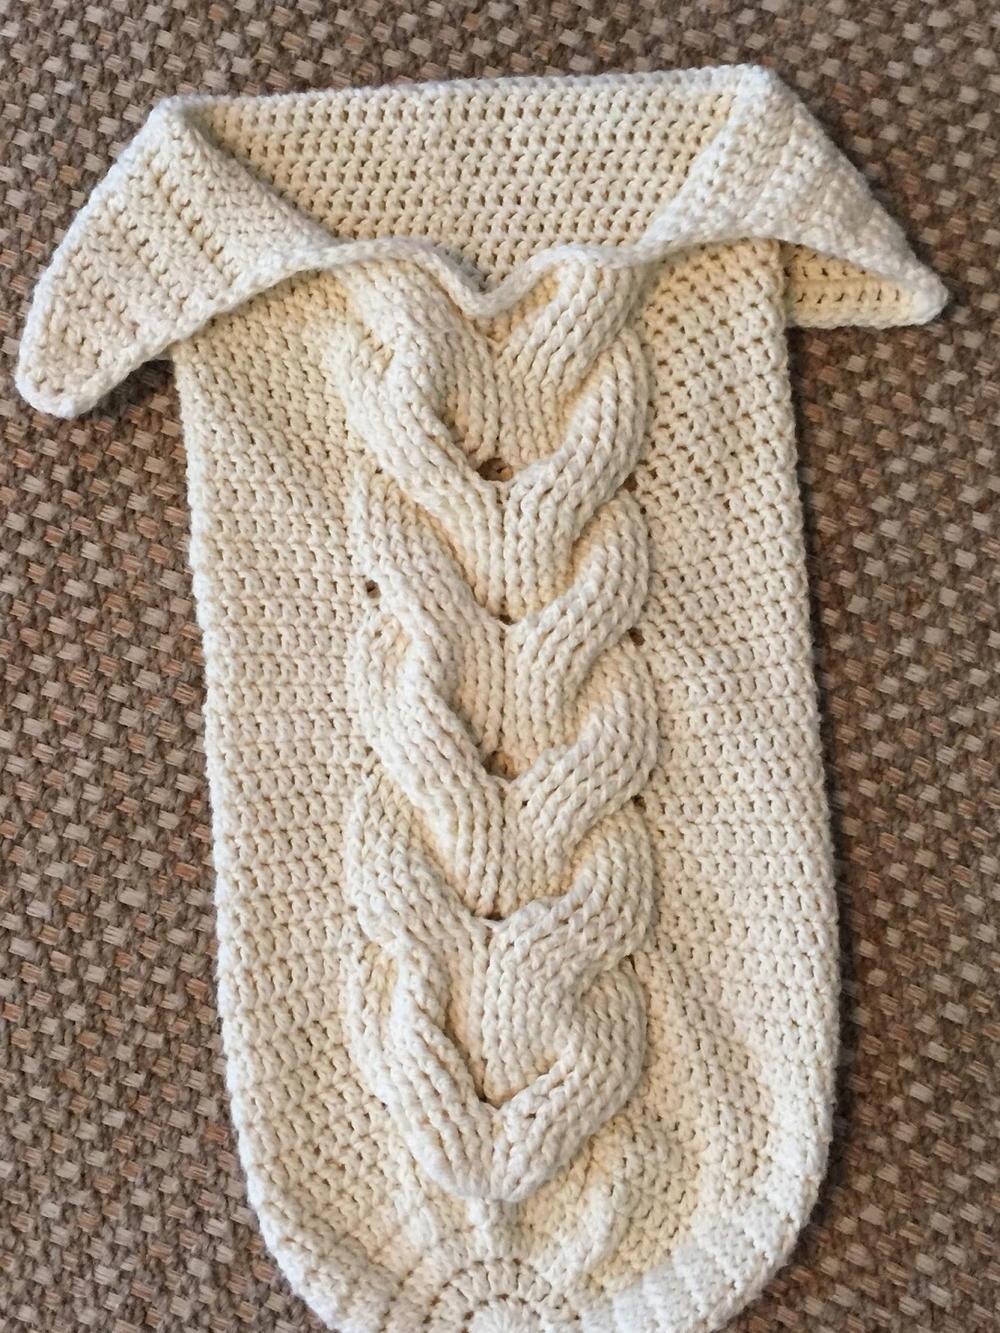 Cuddly Crochet Cable Baby Cocoon AllFreeCrochet.com